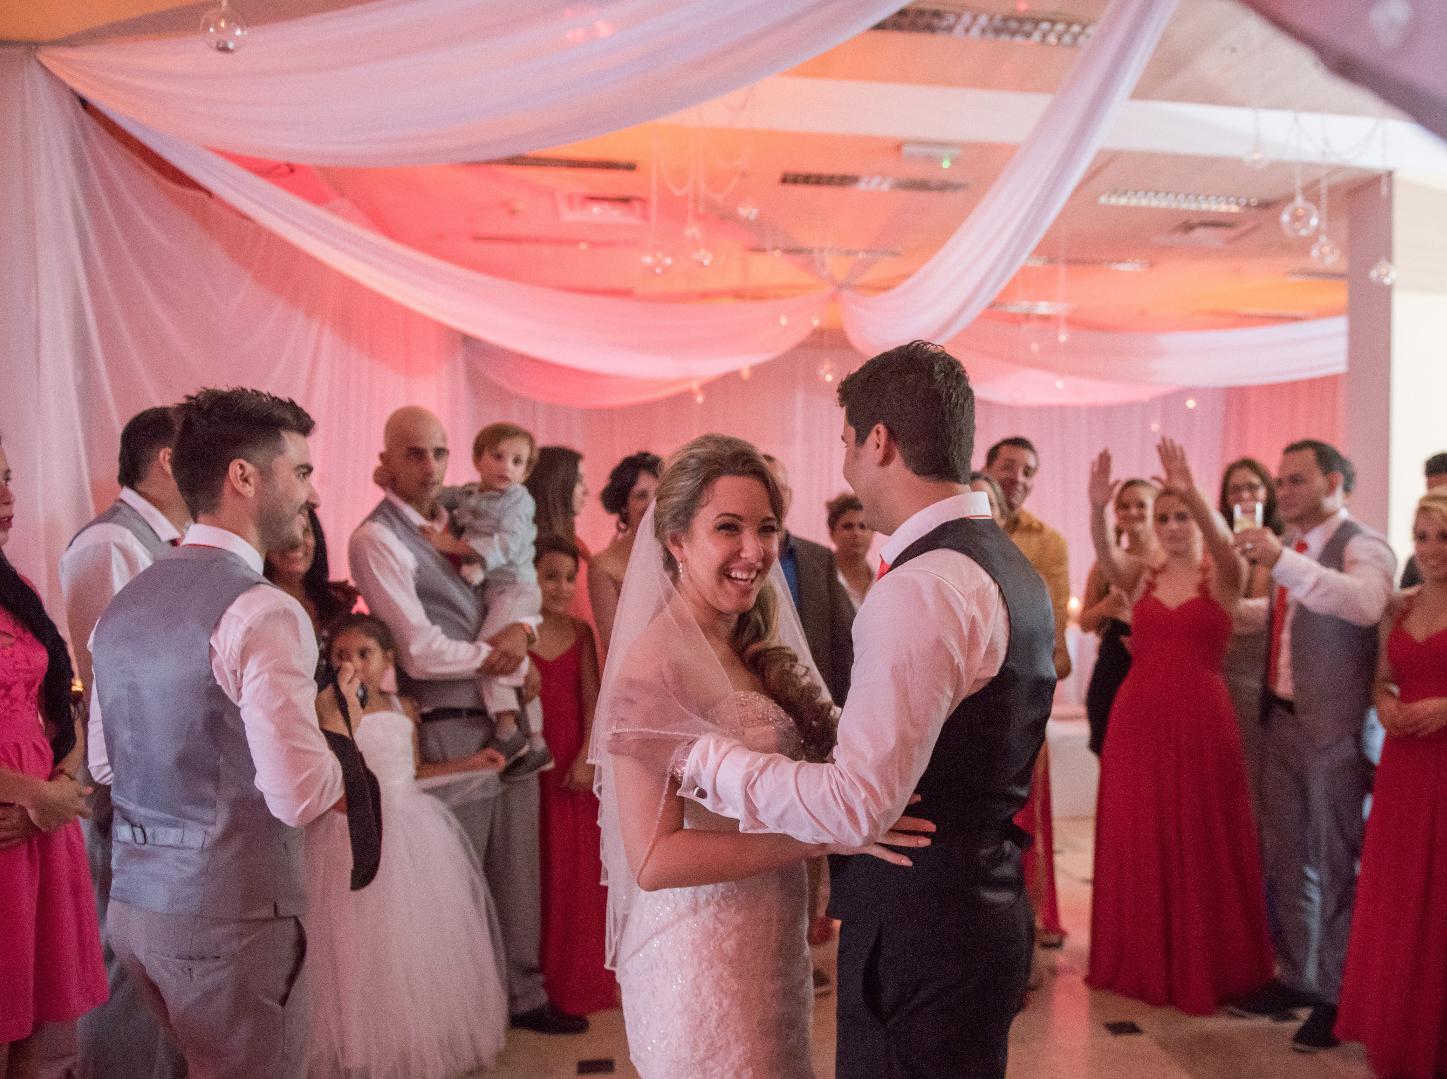 bodas-sin-clasificar-sin-tema-cuba-29542.jpg